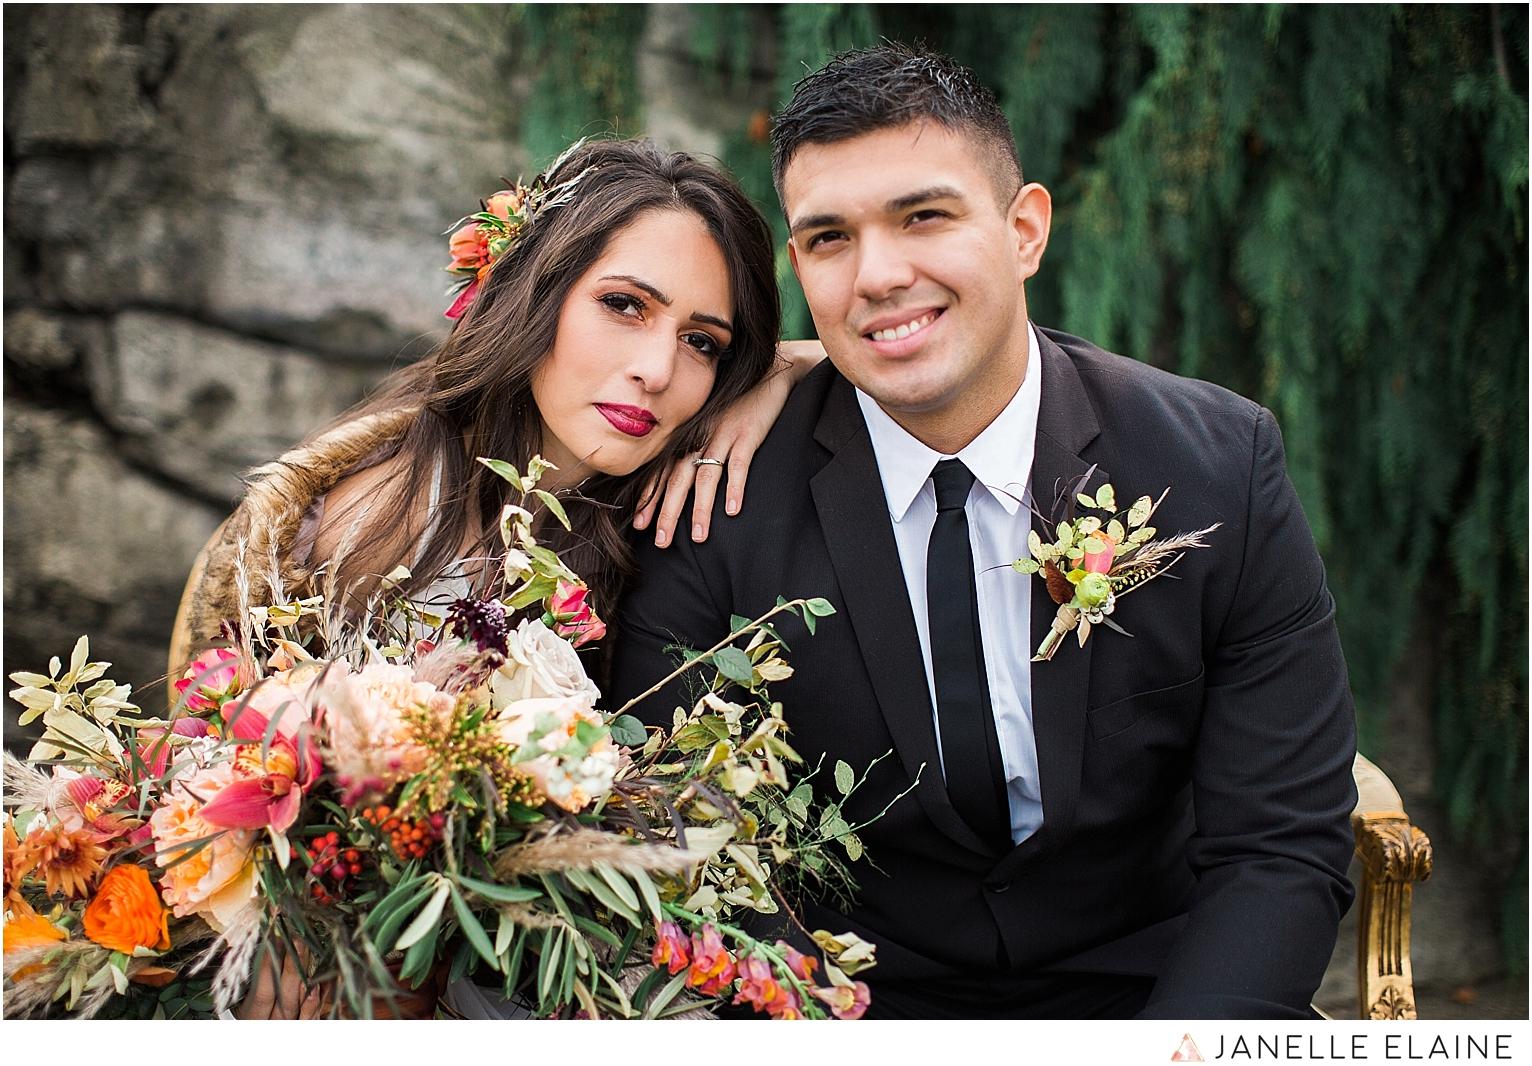 elopement-wedding-photographer-seattle washington-photographers-64.jpg